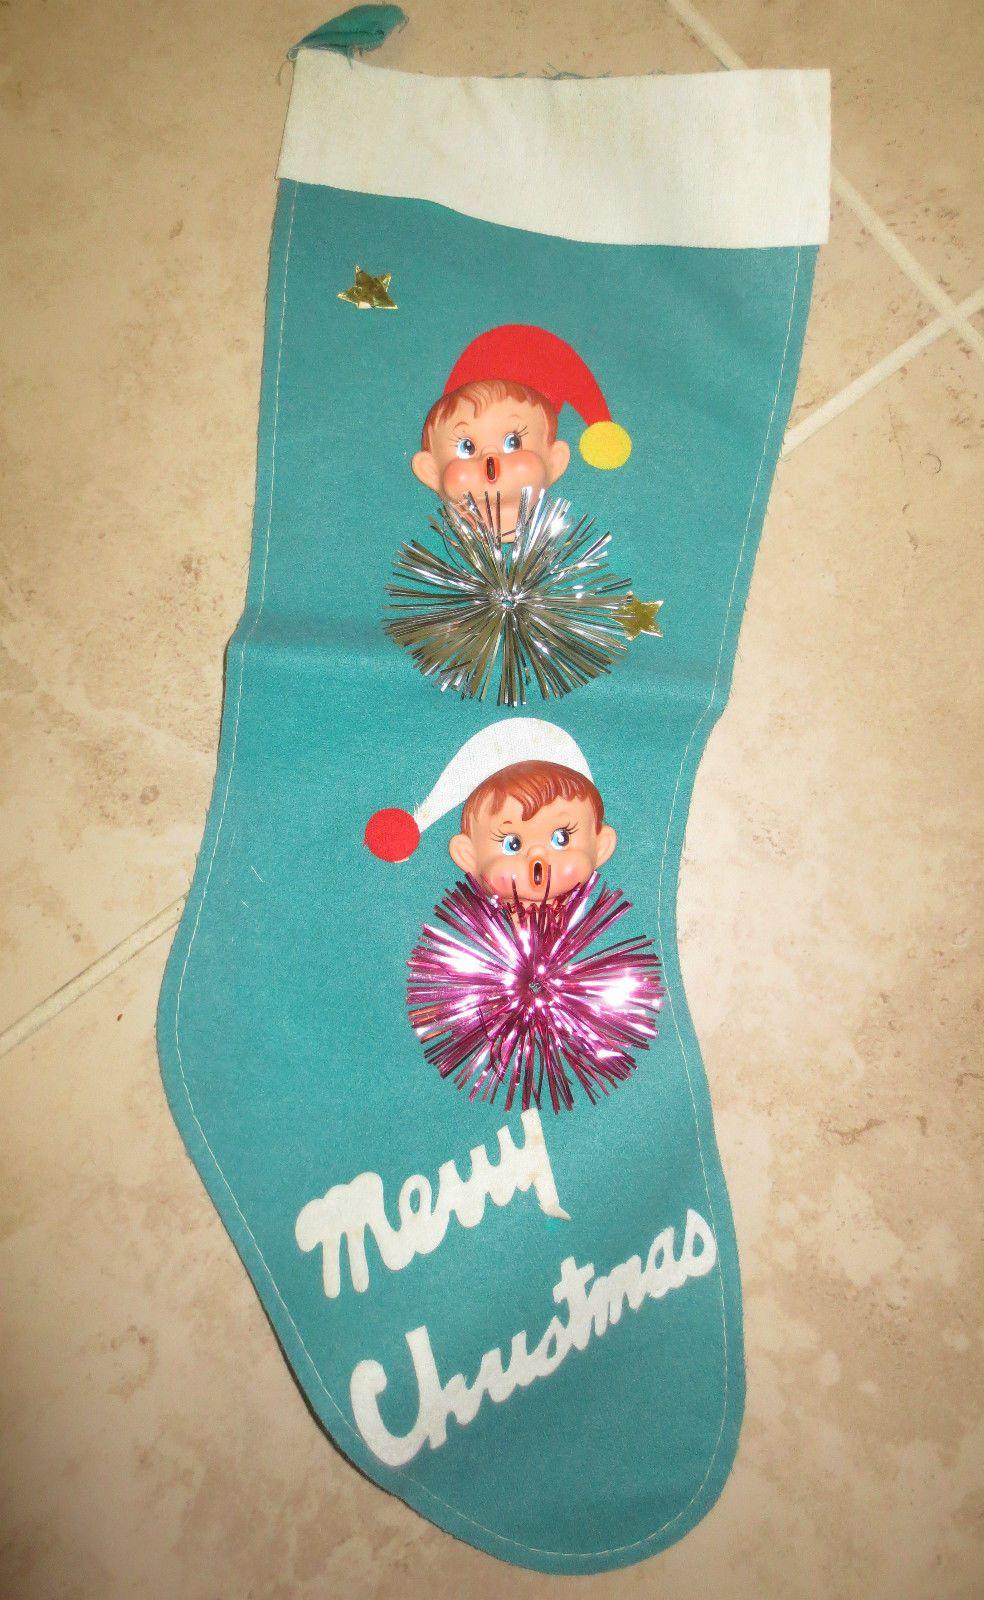 Bradford christmas ornaments - Details About Adorable Vintage Felt Christmas Elf Boy Stocking